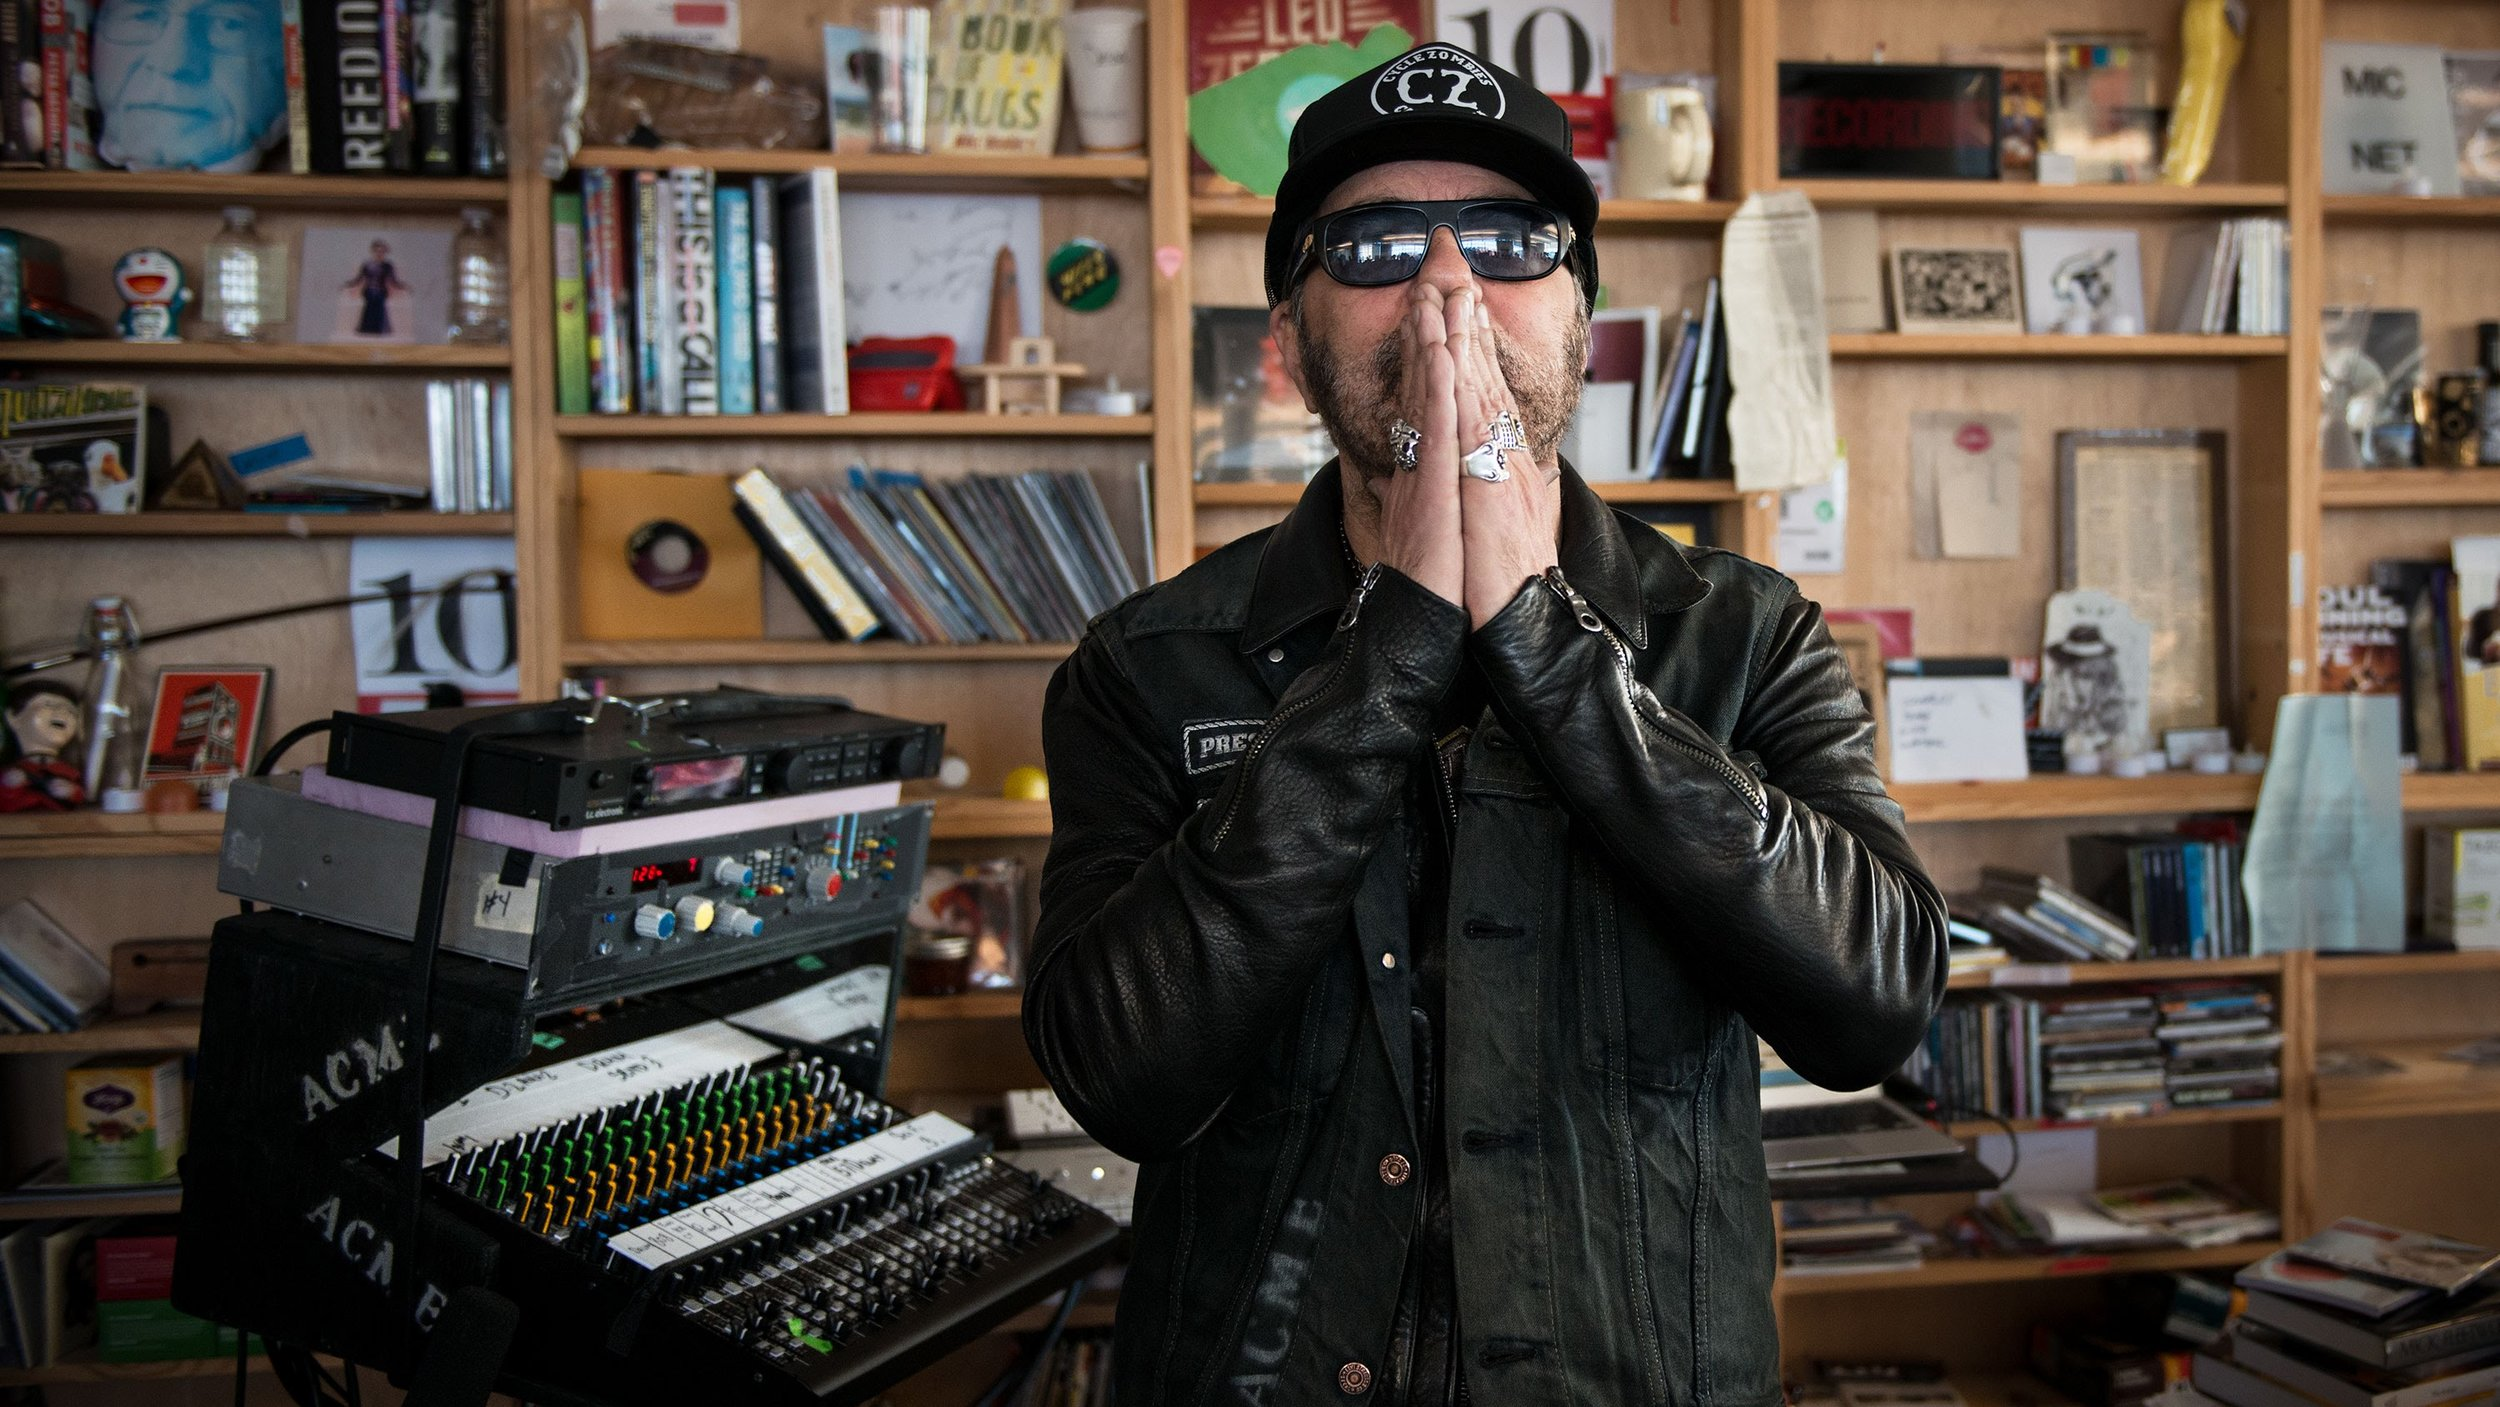 Daniel Lanois (Tiny Desk Concert at NPR Studio)